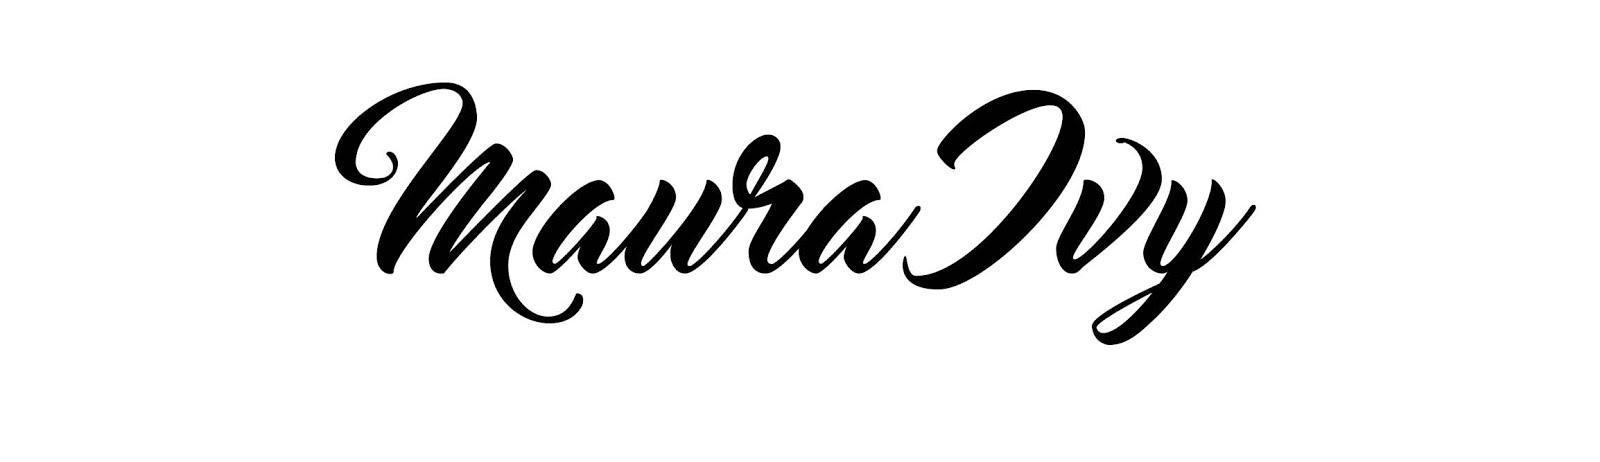 MAURA IVY